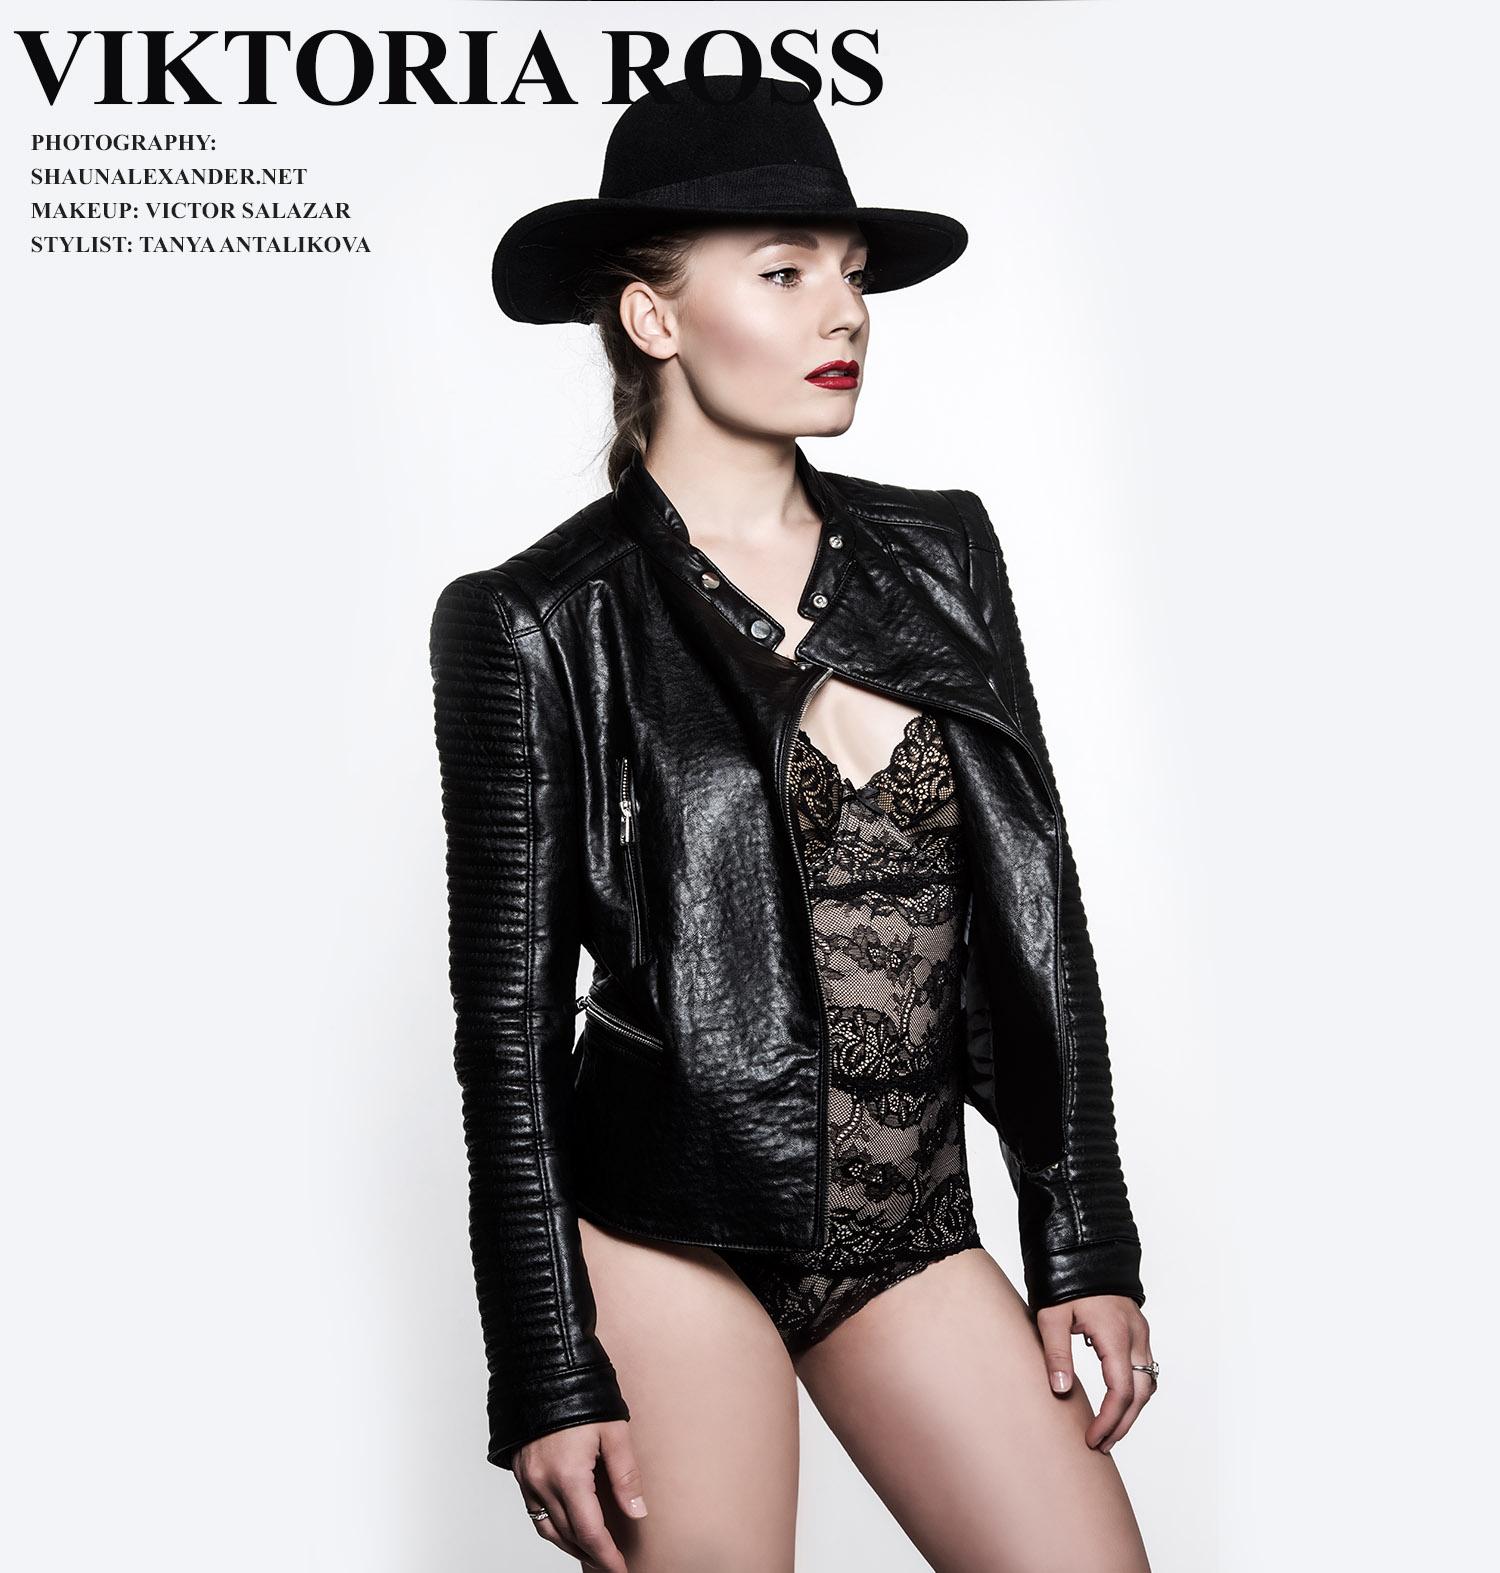 VIKTORIA ROSS RUSSIAN UKRAINIAN SINGER ALBUM COVER